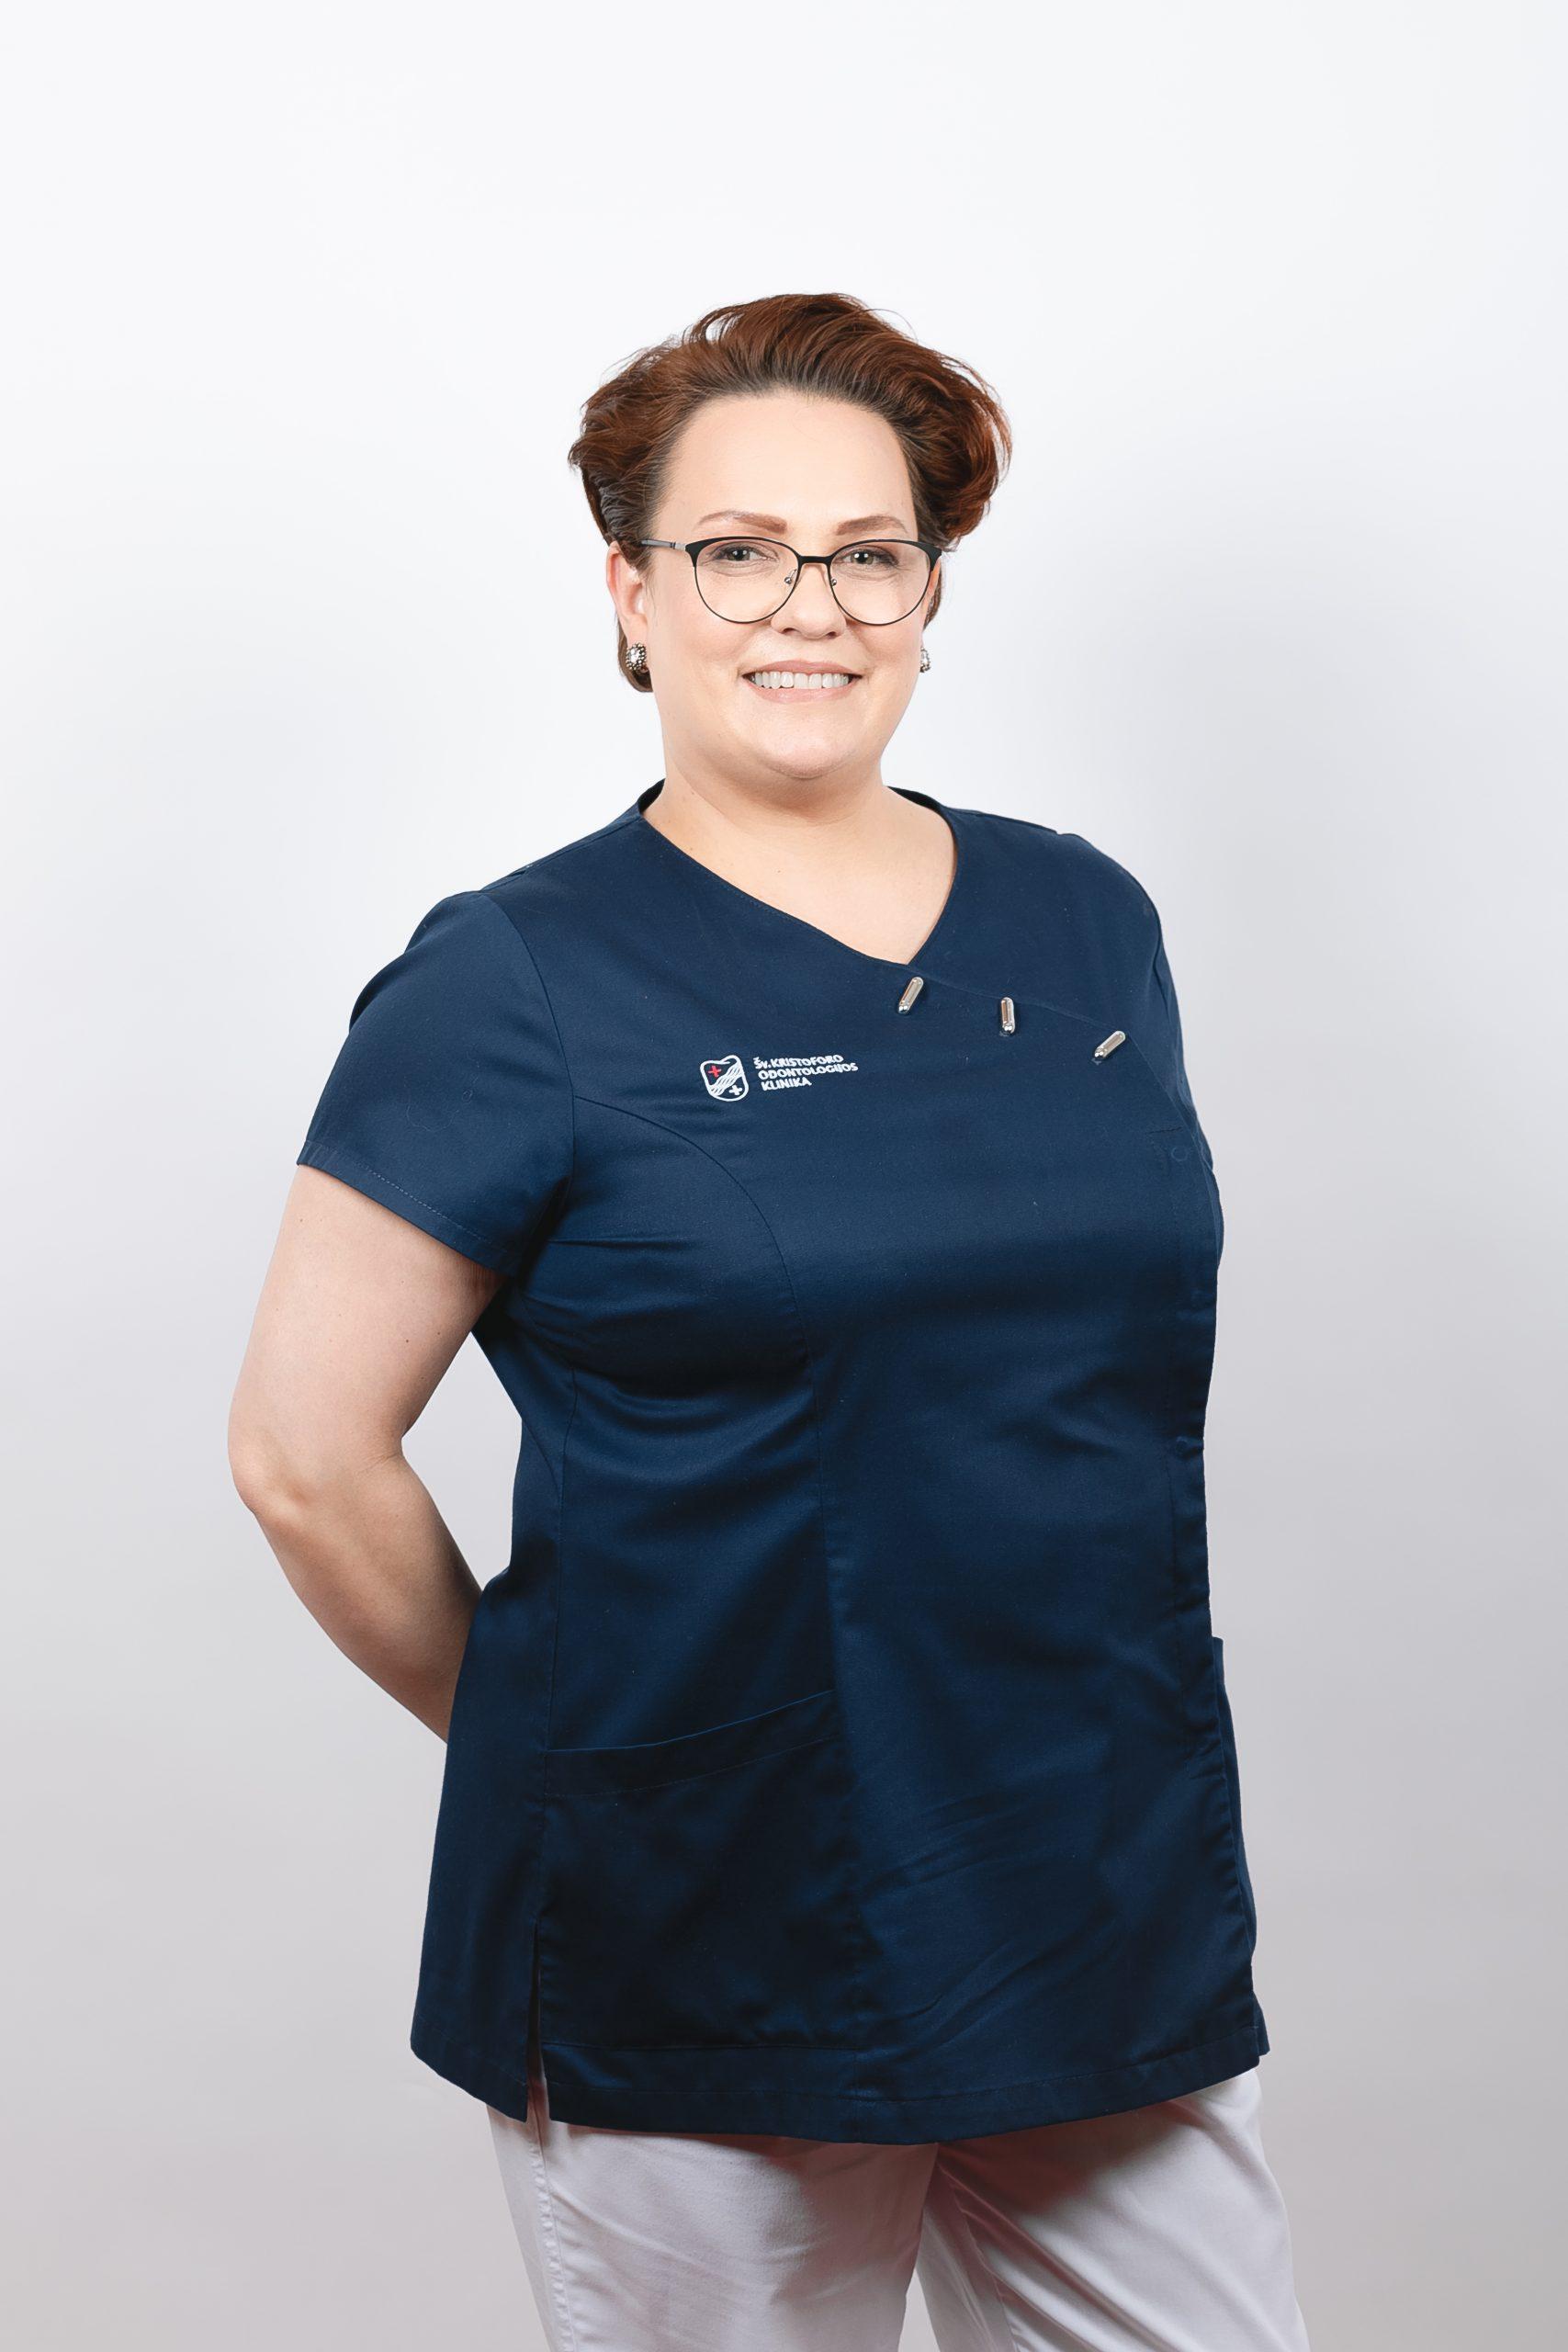 Burnos higienistė Milda Misūnaitė